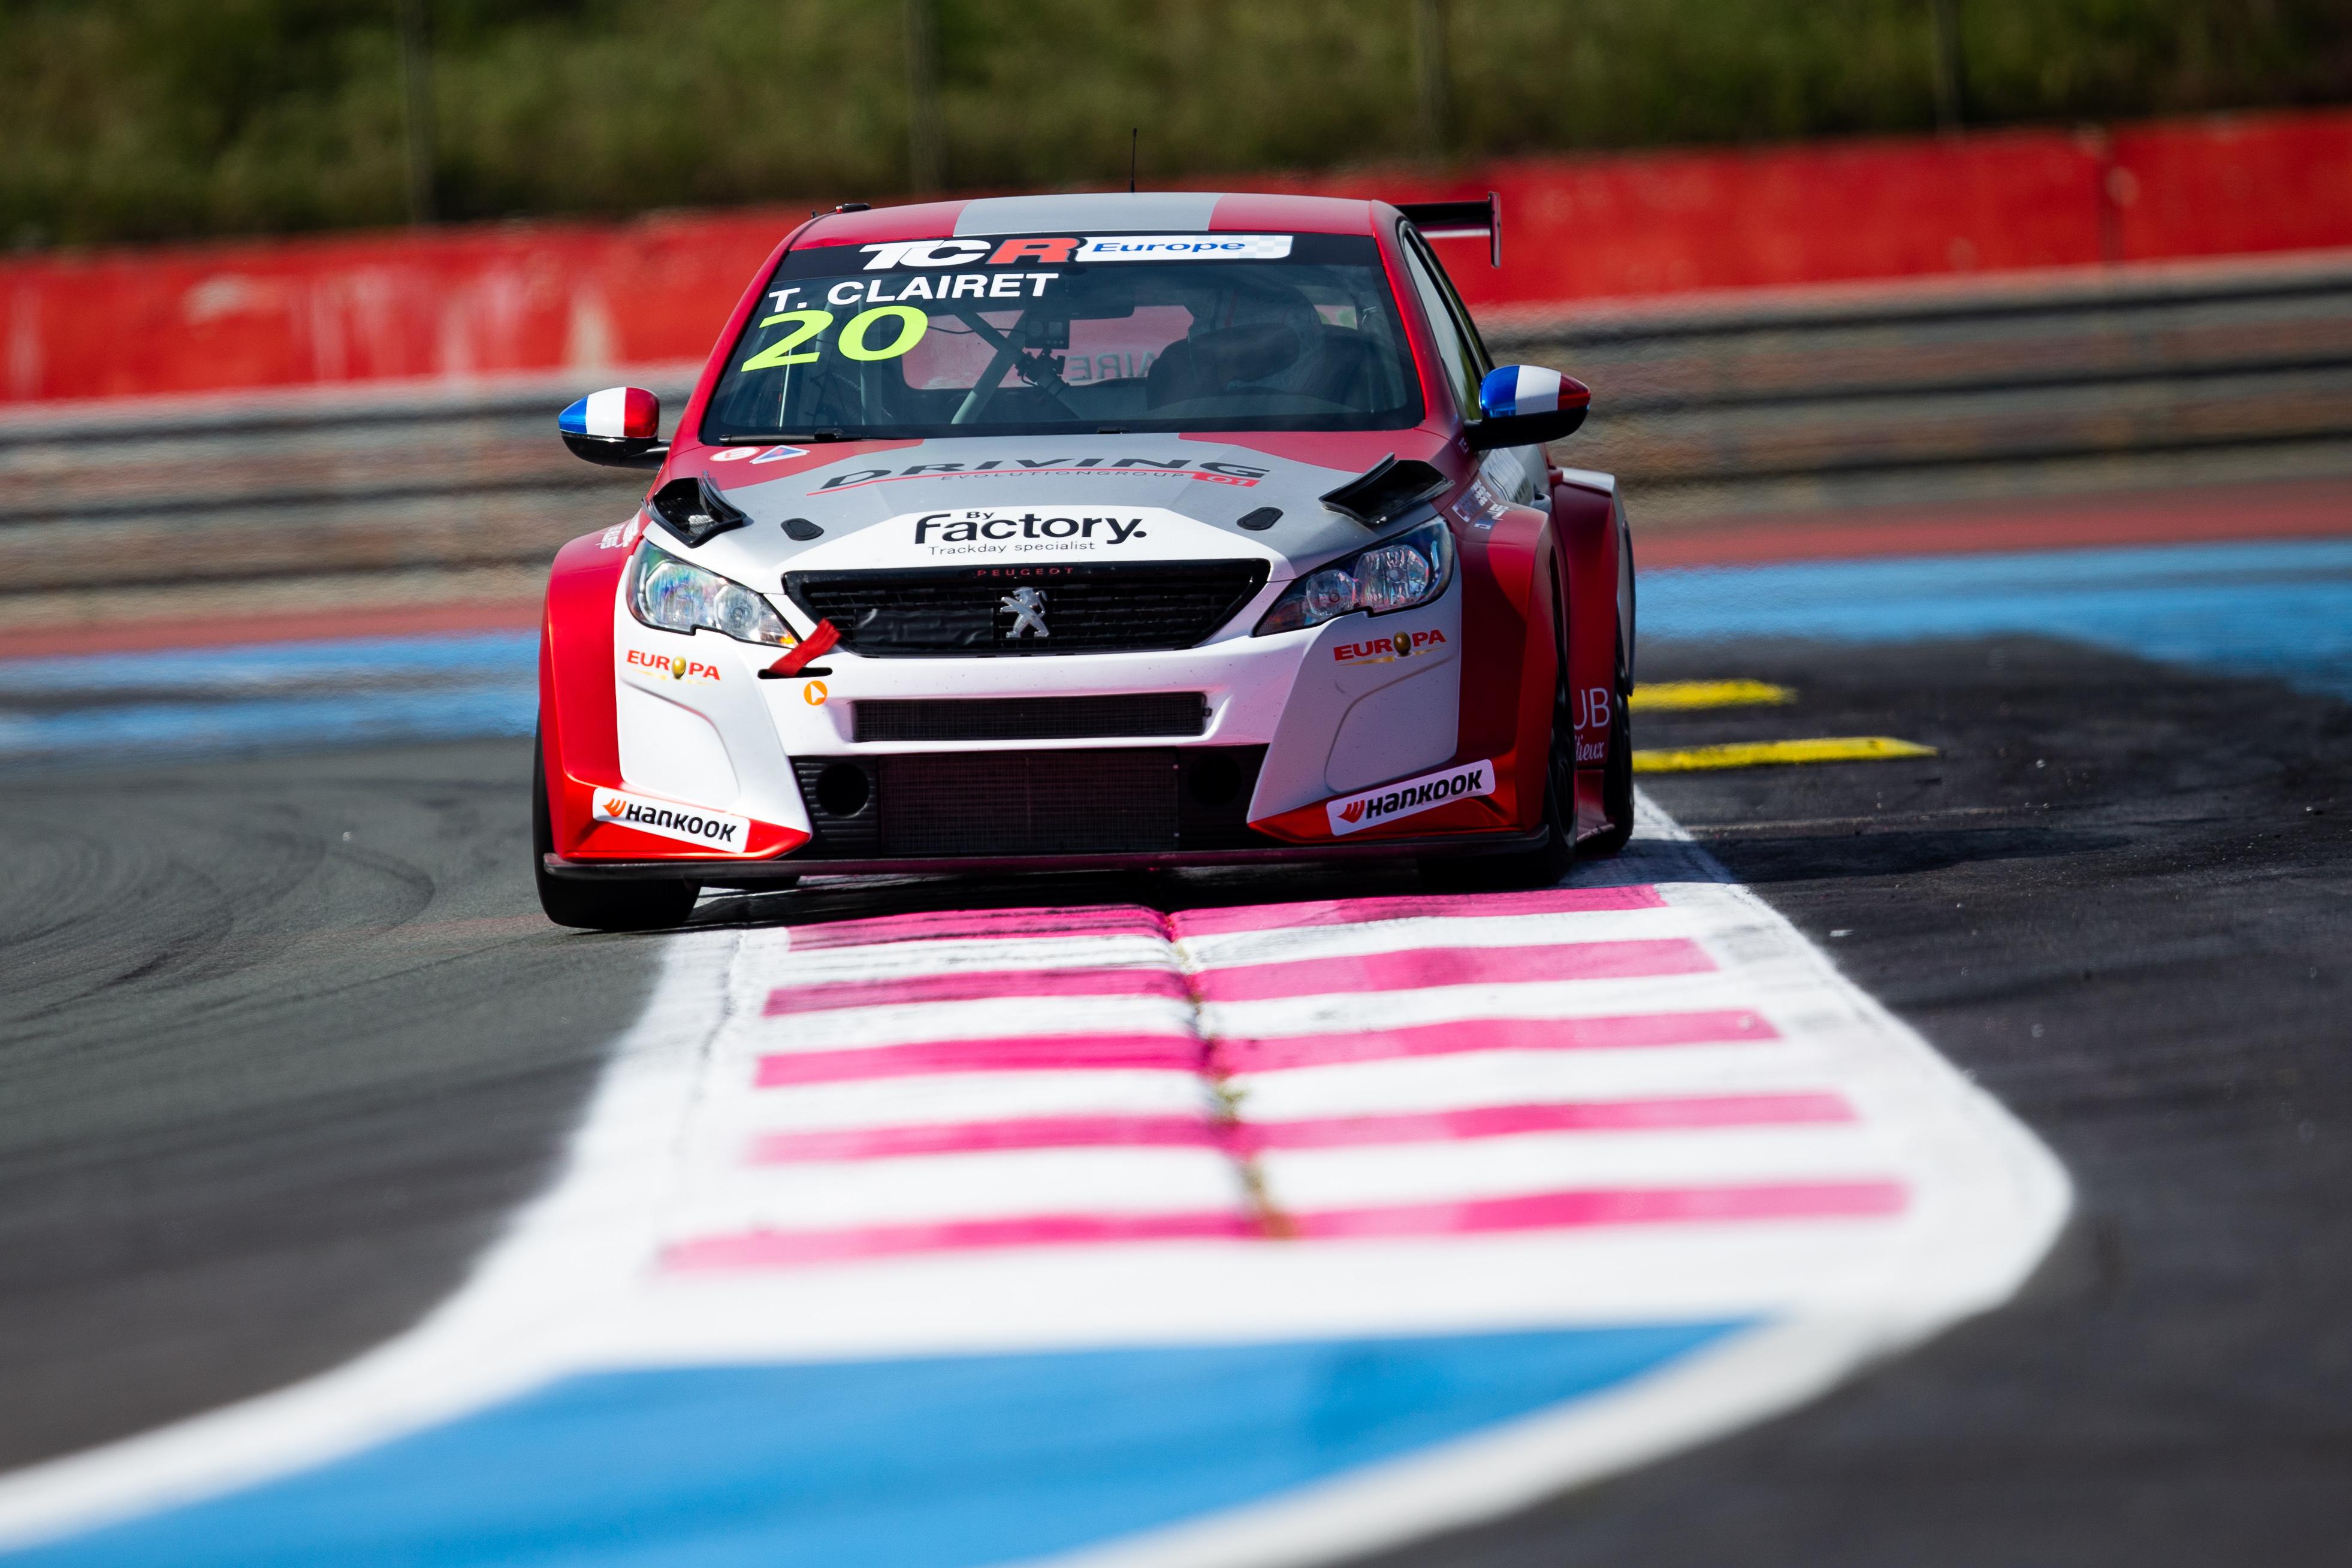 2021 Le Castellet Qualifying